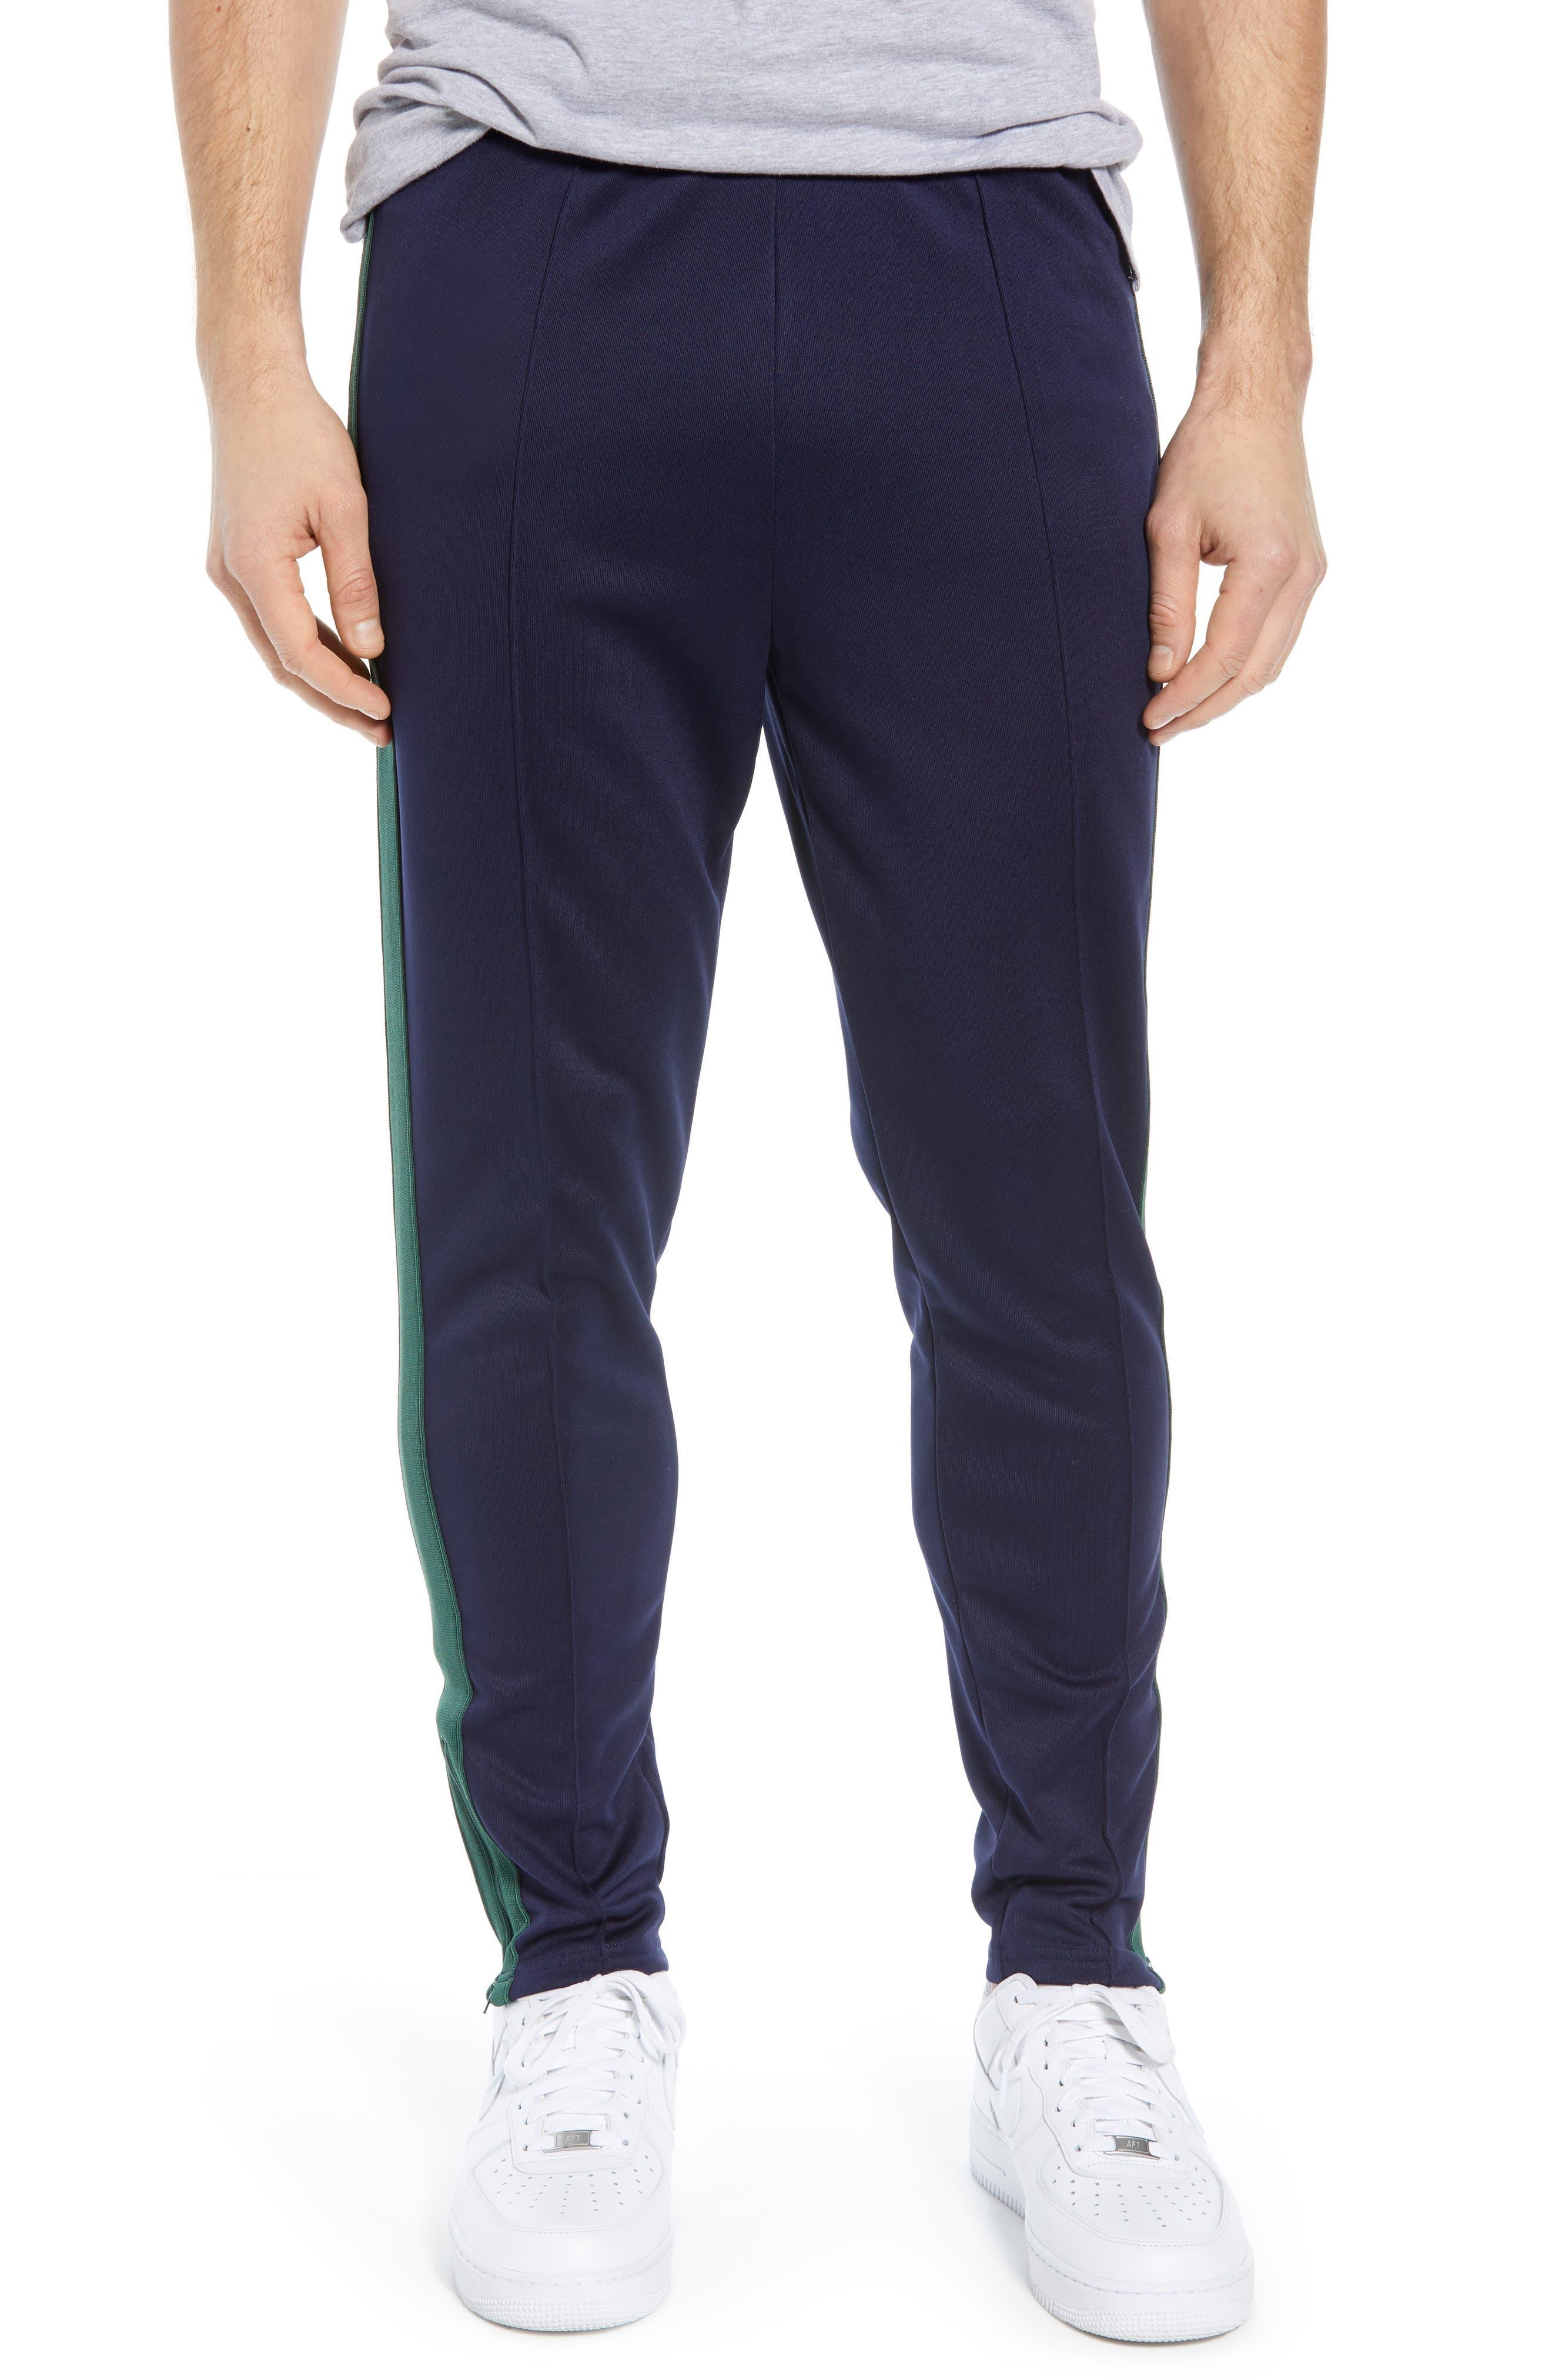 NIKE,                             x Martine Rose Men's Track Pants,                             Main thumbnail 1, color,                             BLACKENED BLUE/ FIR